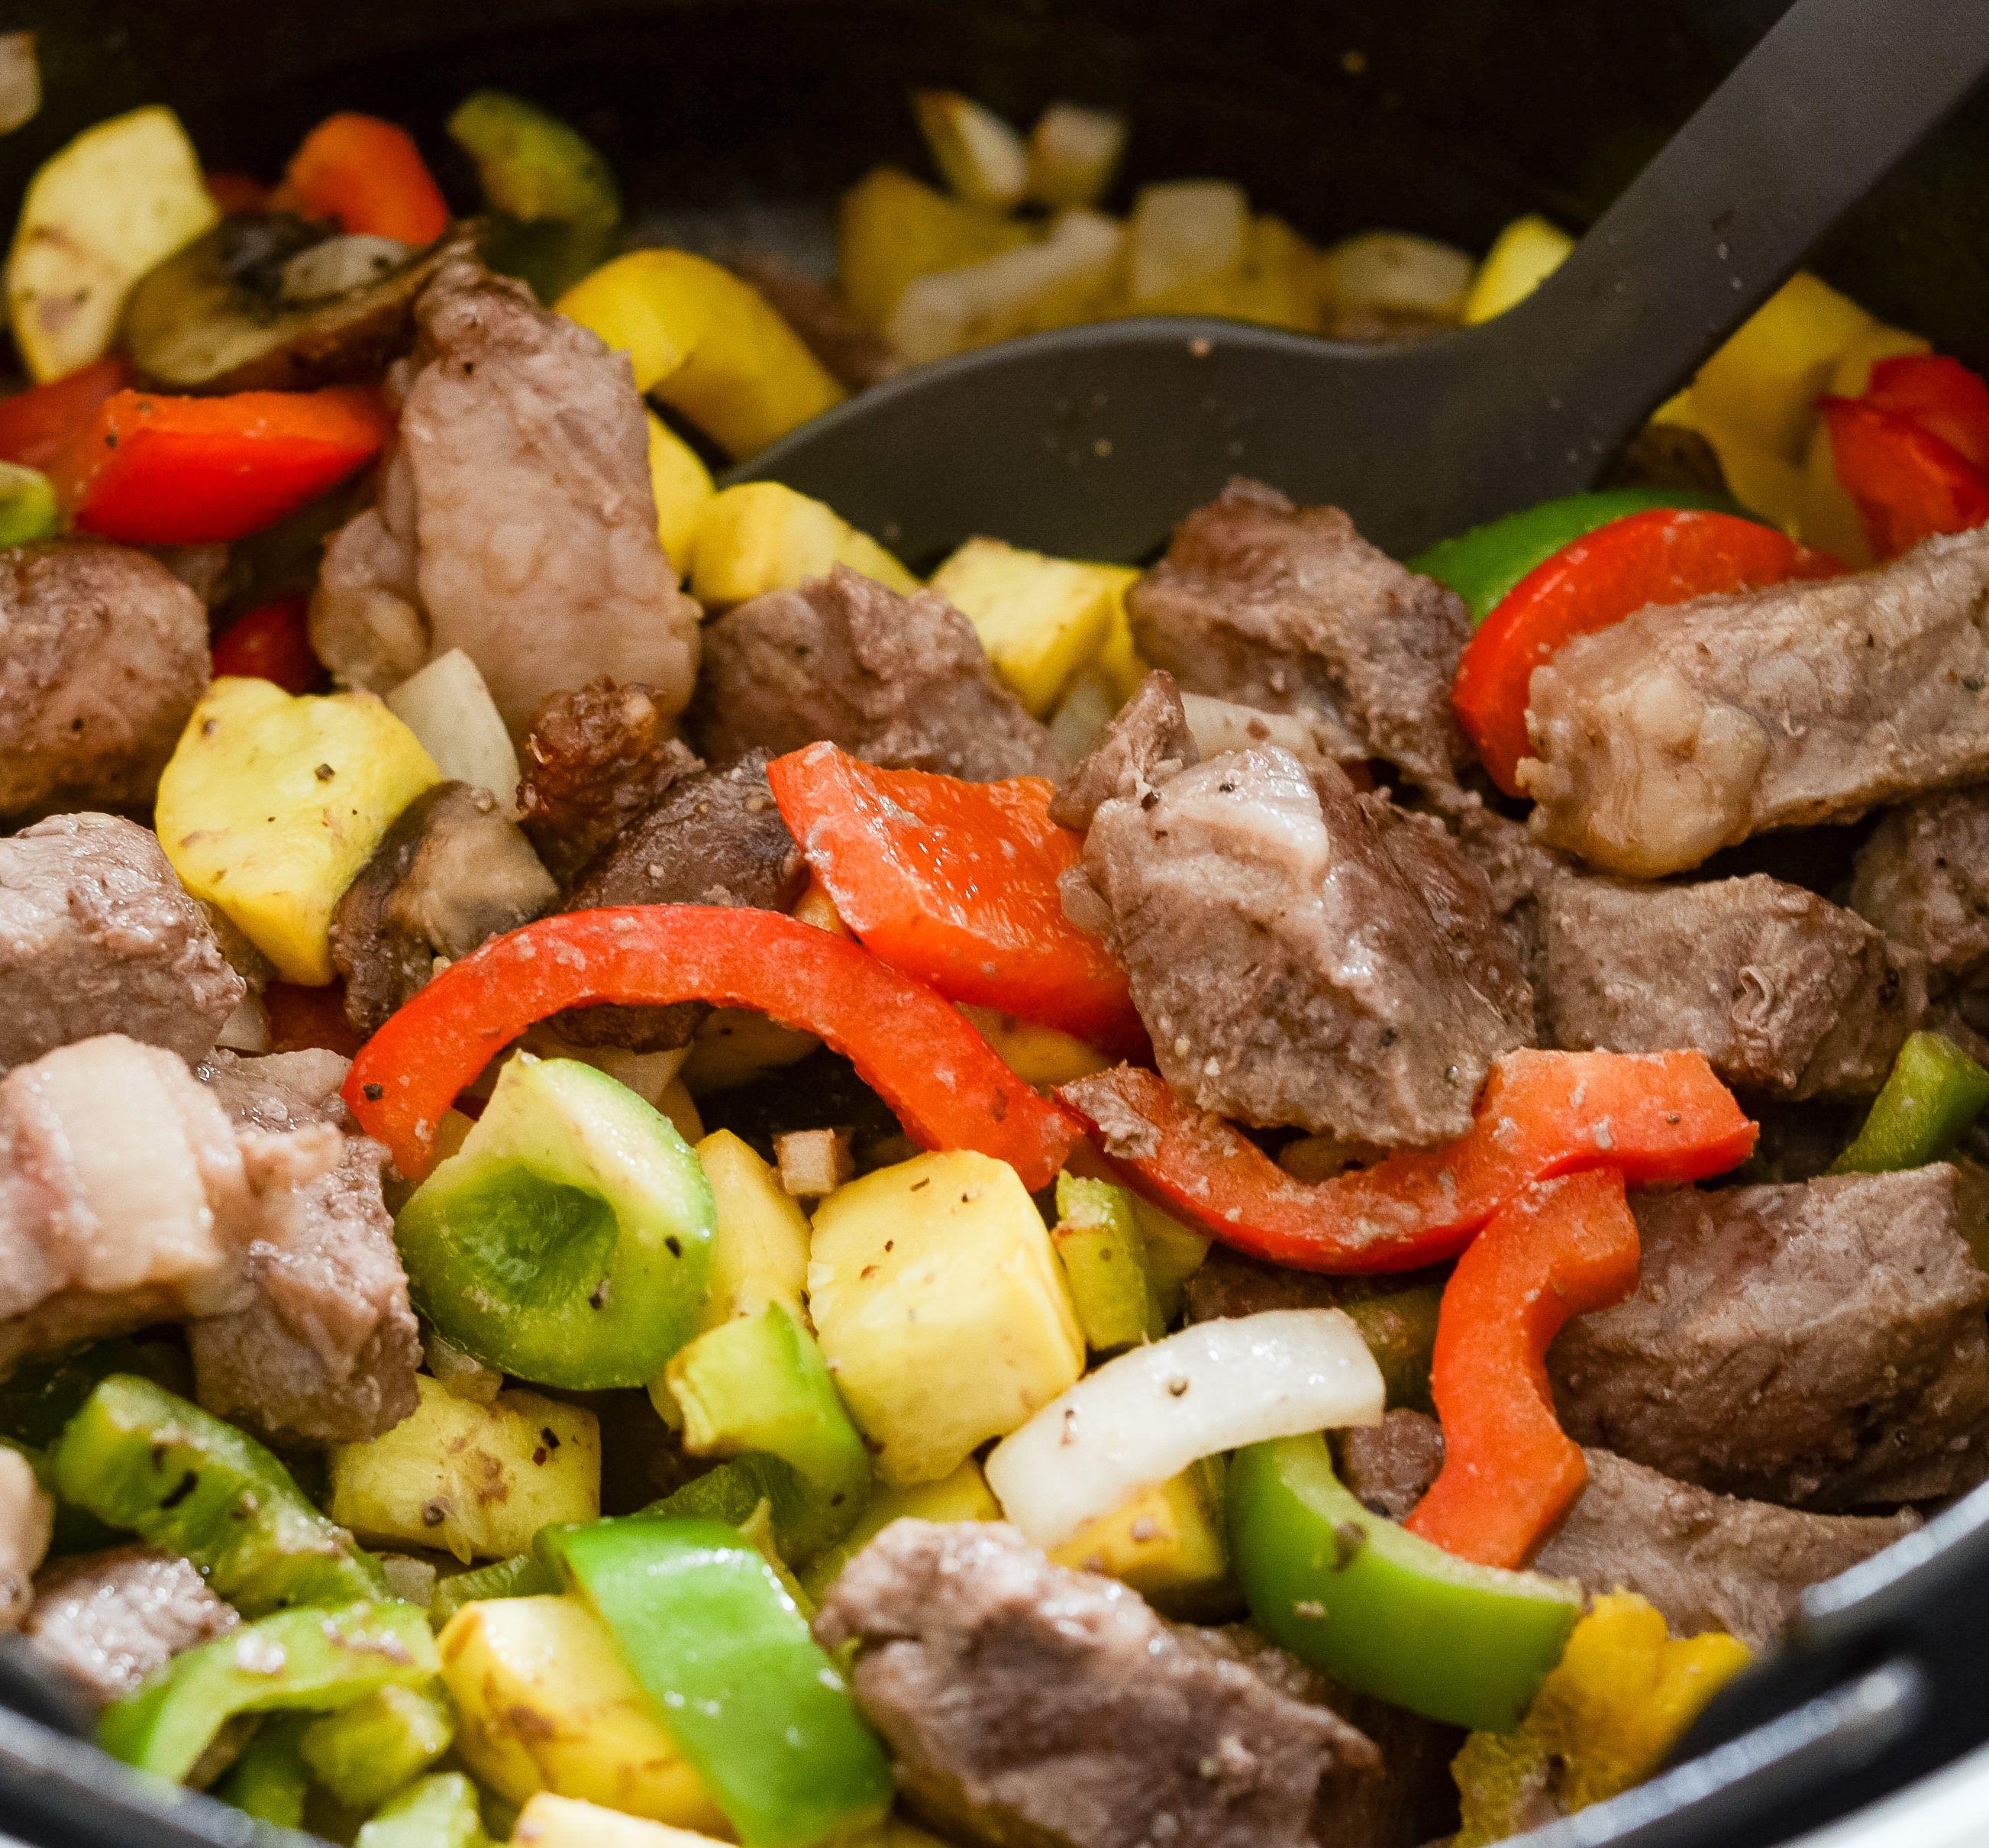 Ninja Foodi Steak and Vegetable Bowls Recipe Air fryer